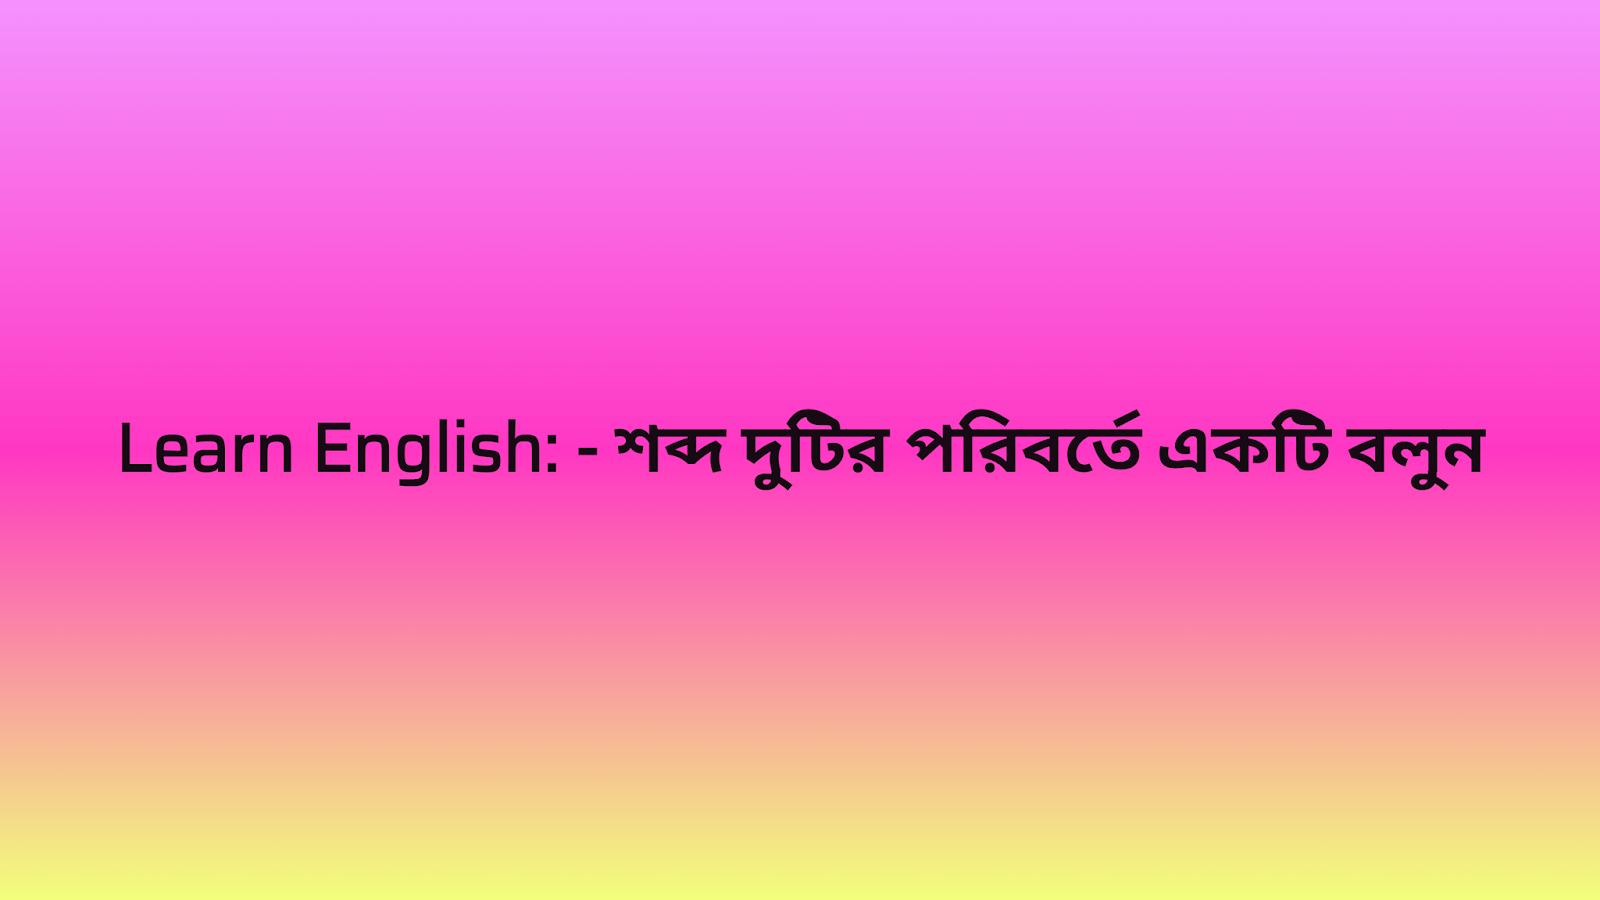 Learn English: - শব্দ দুটির পরিবর্তে একটি বলুন, gk, competitive, job, exam, knowledge, English, important